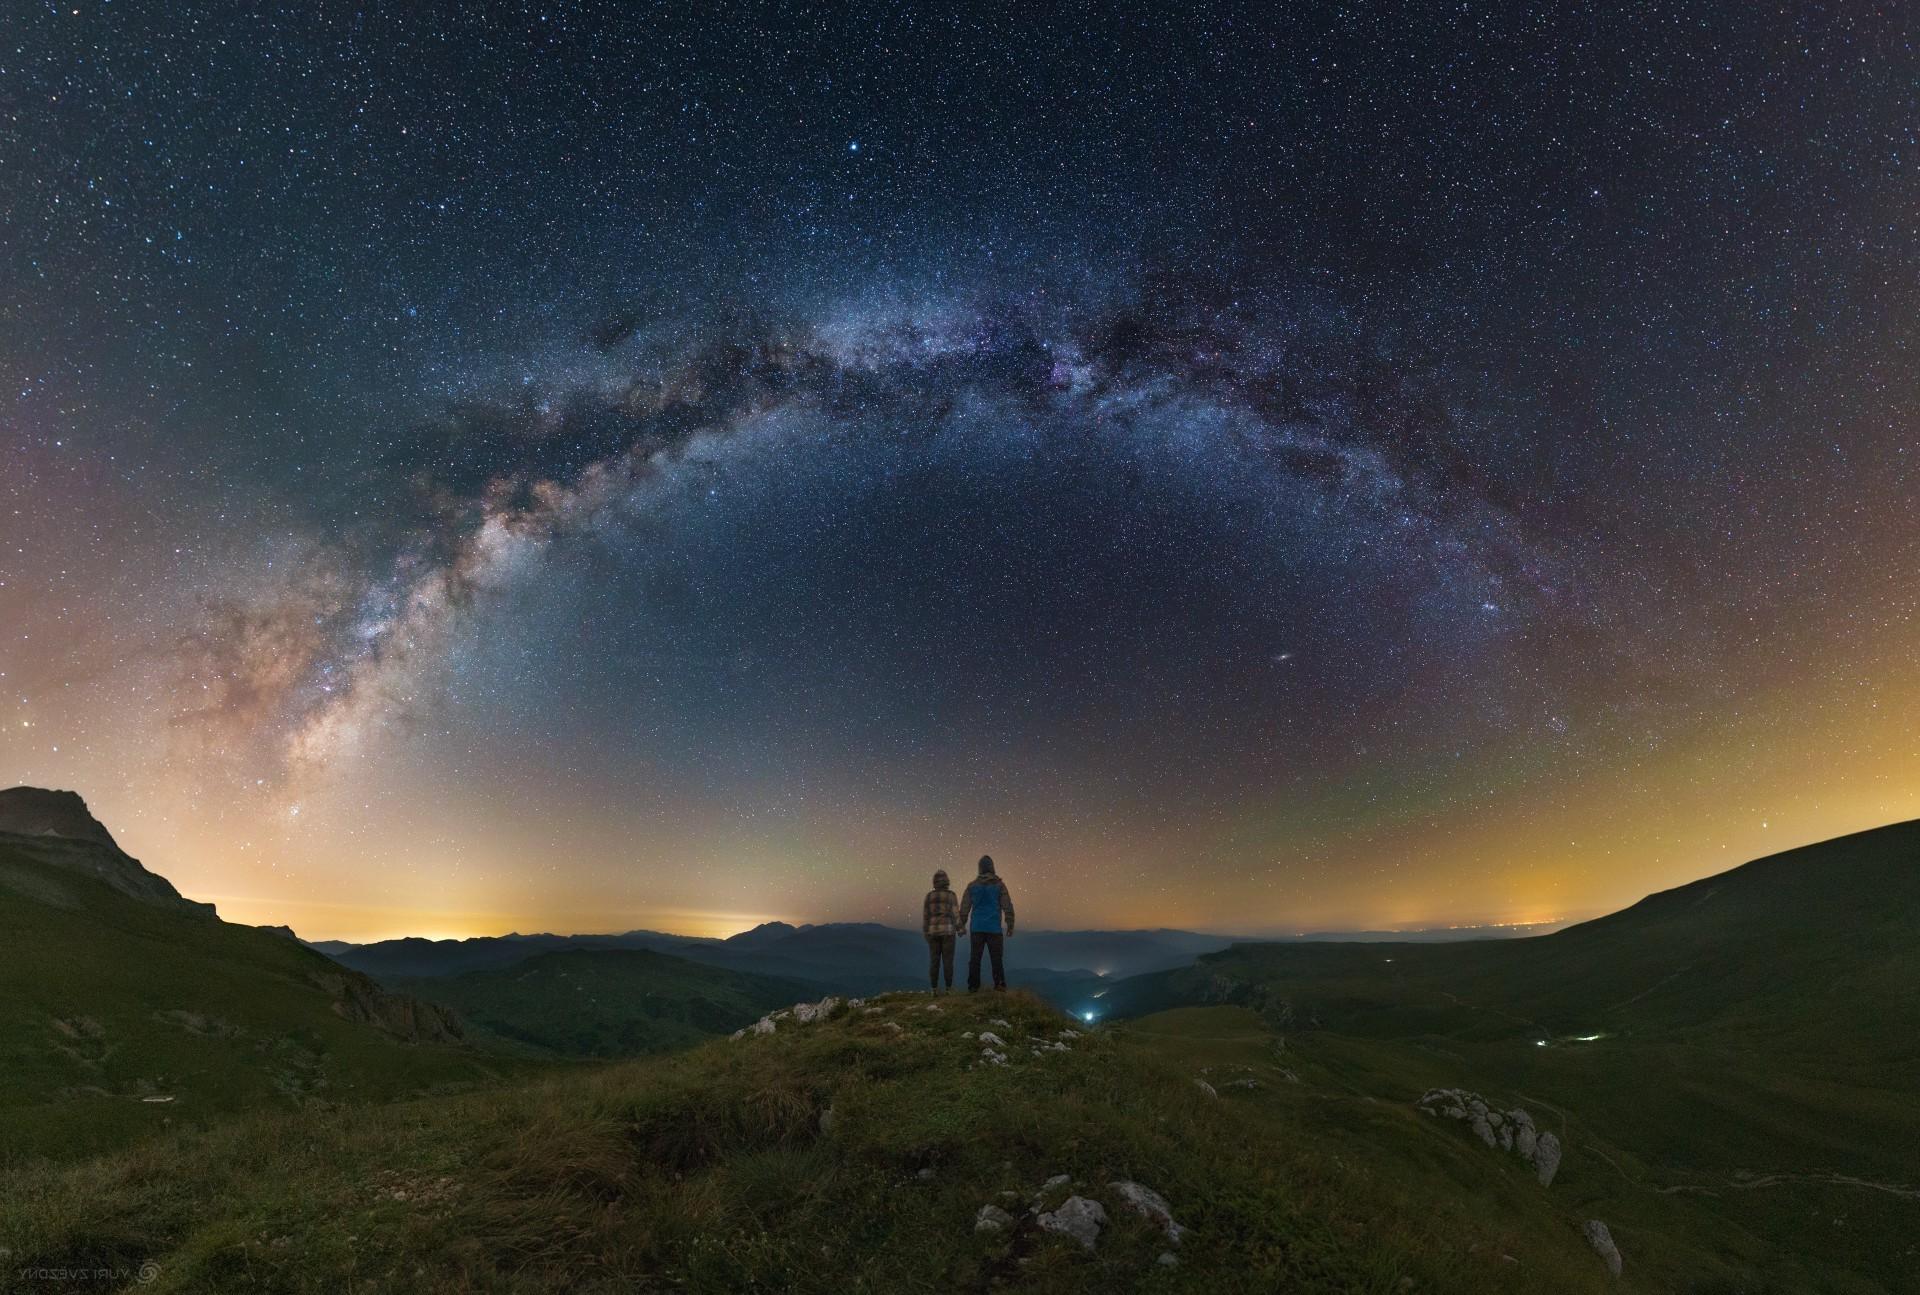 HD <b>Milky Way Wallpapers</b> – WallpaperSafari